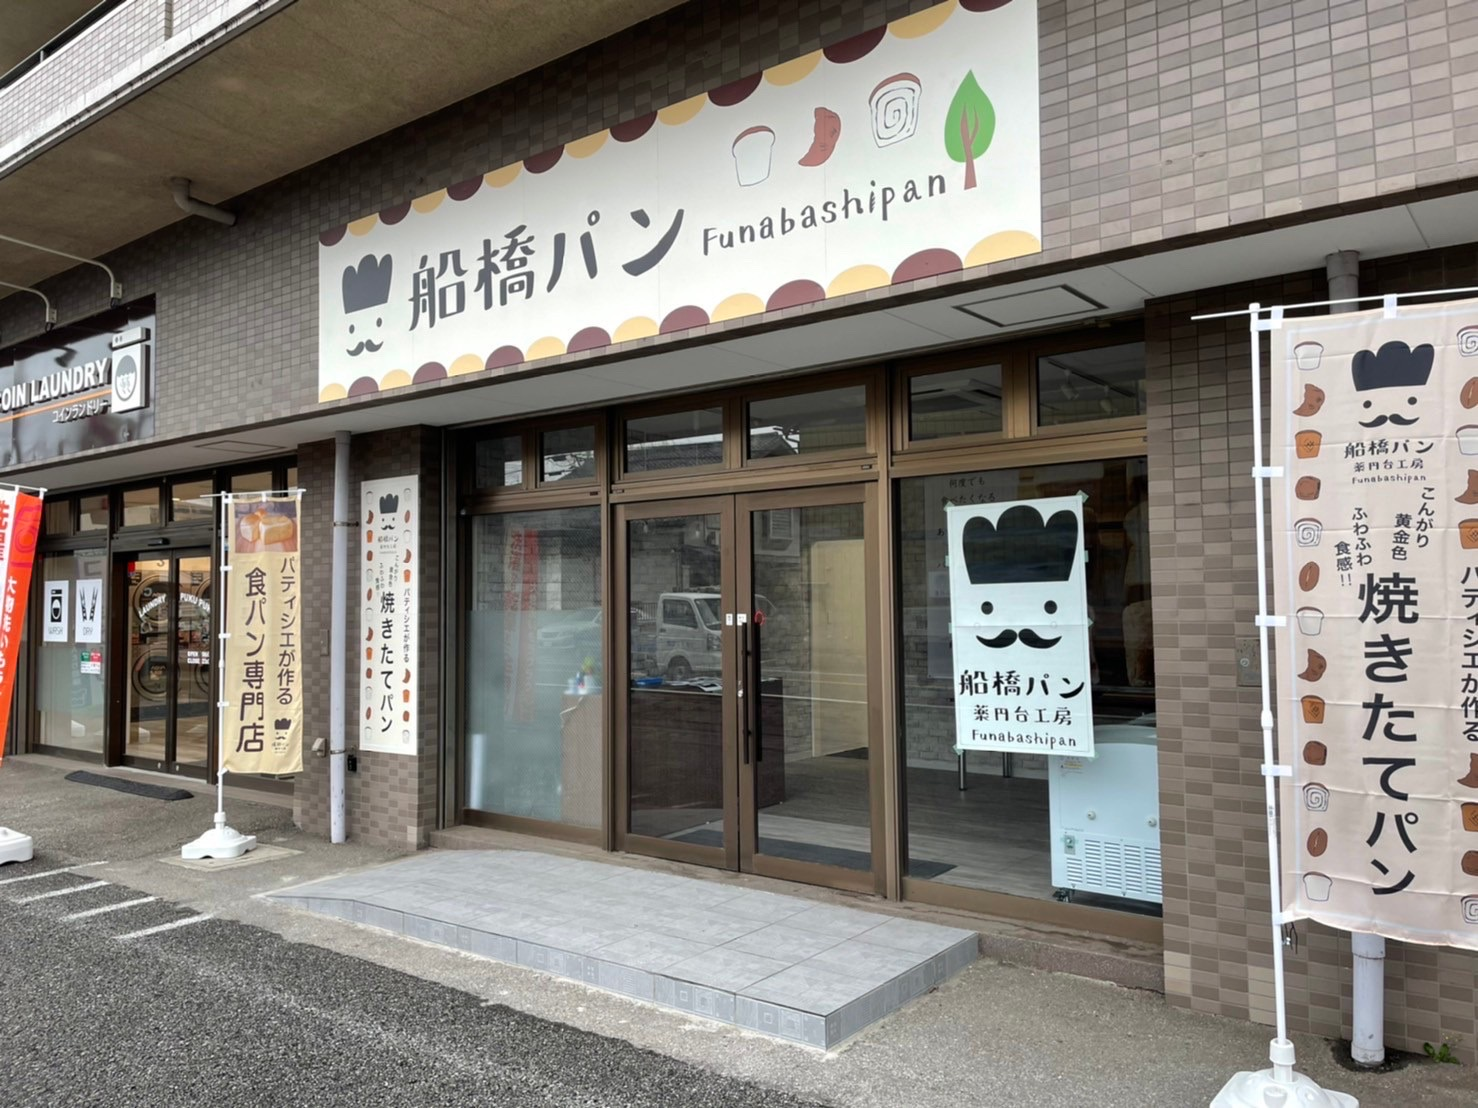 http://船橋パン